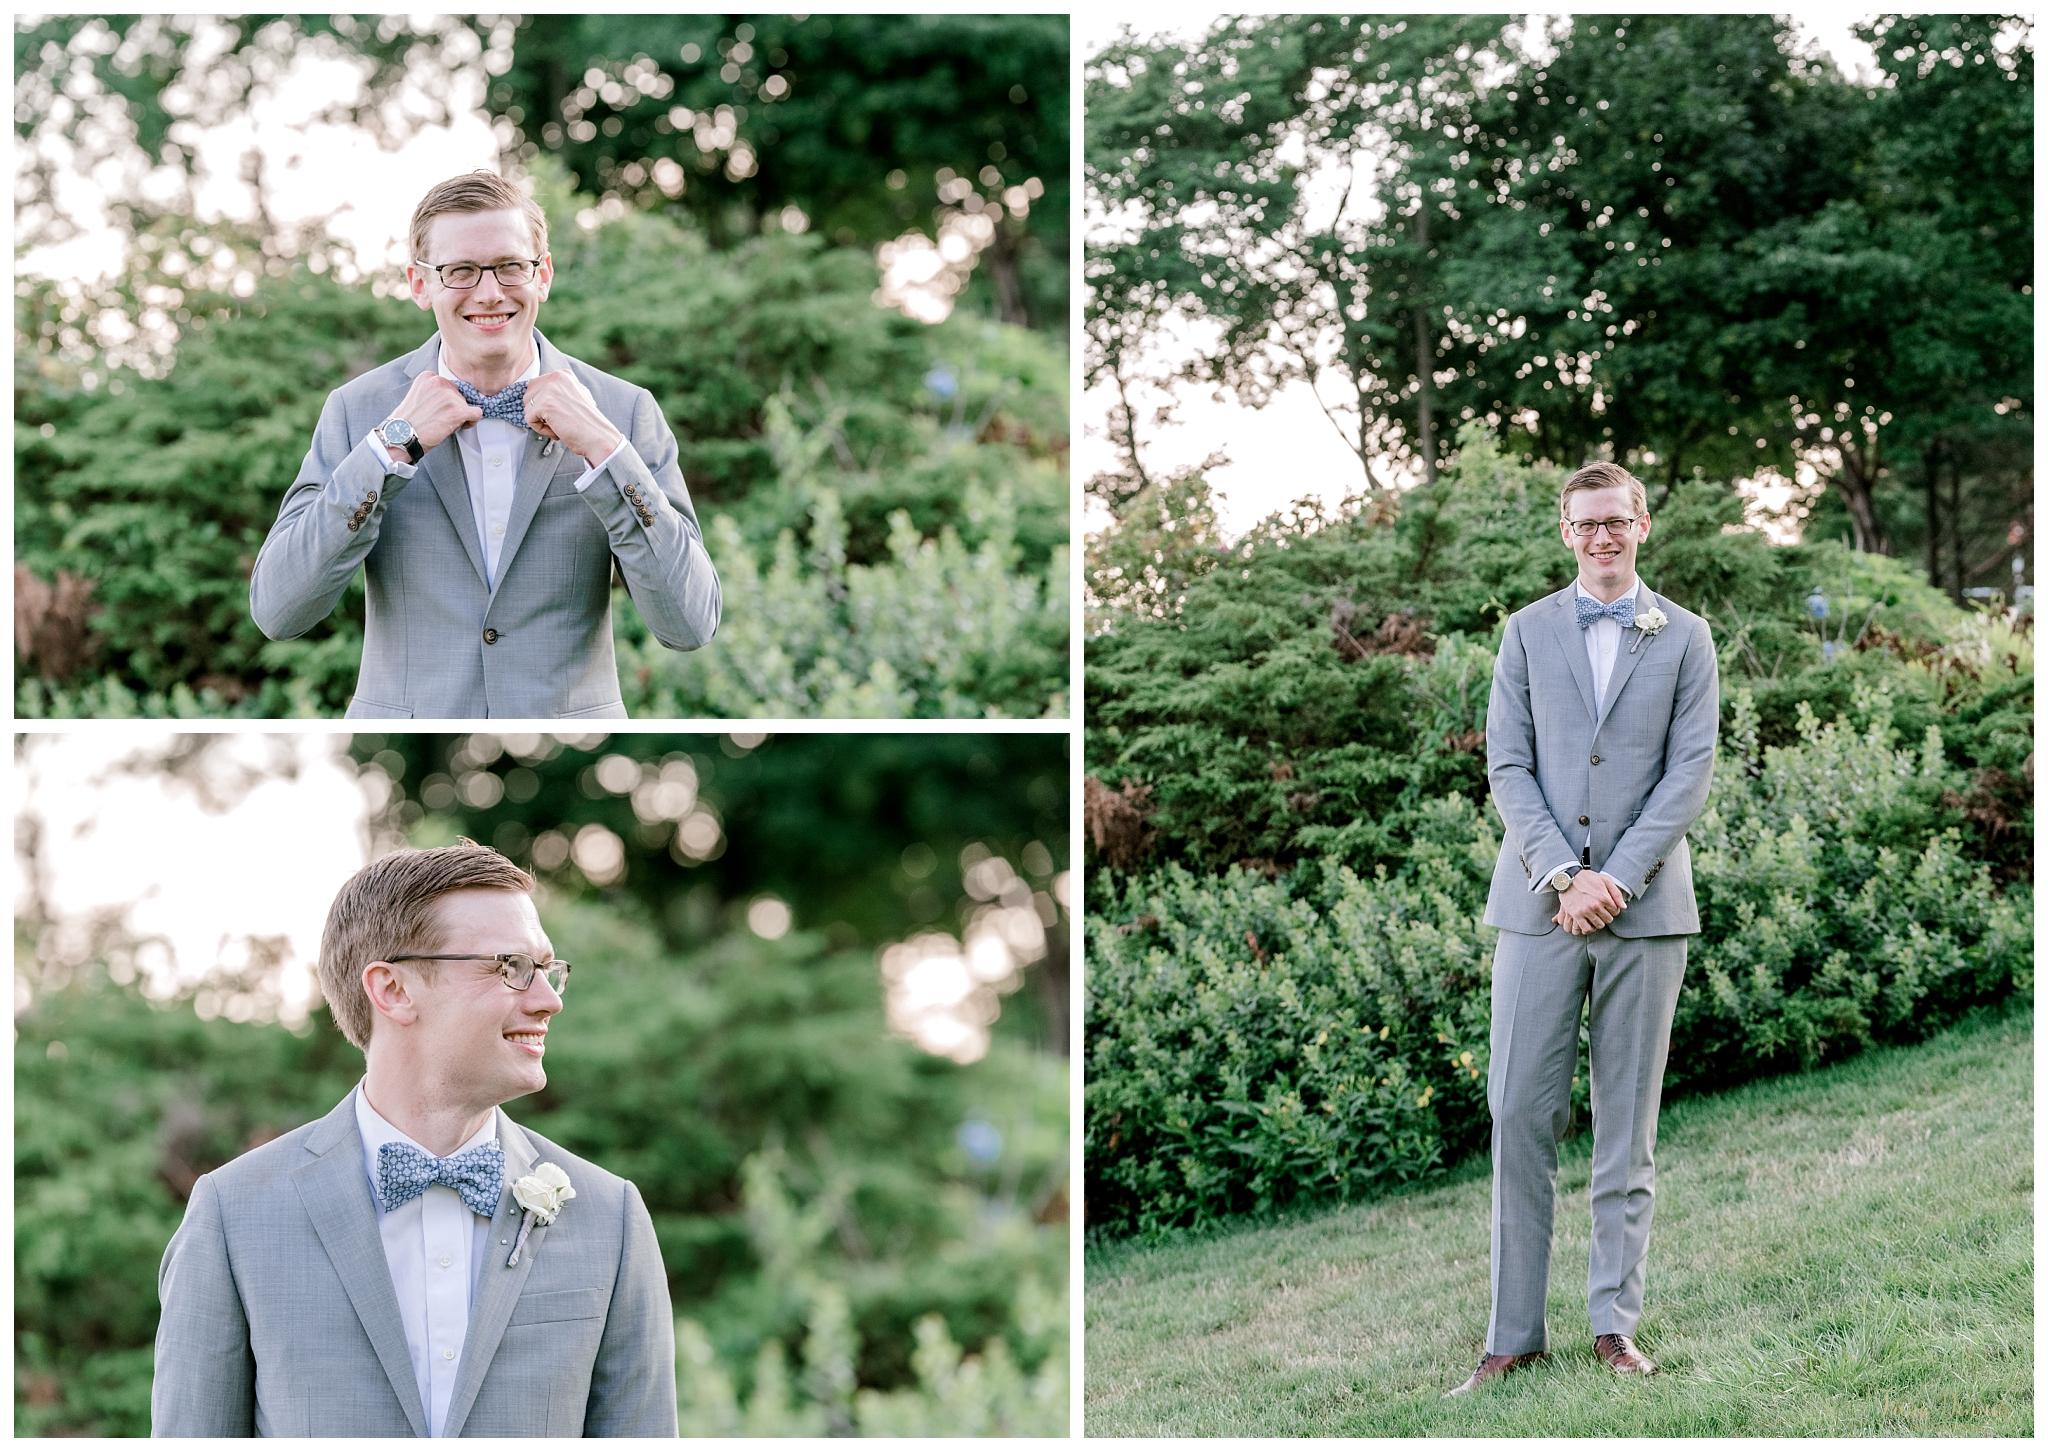 Hugh's Groom Wedding Day Portraits